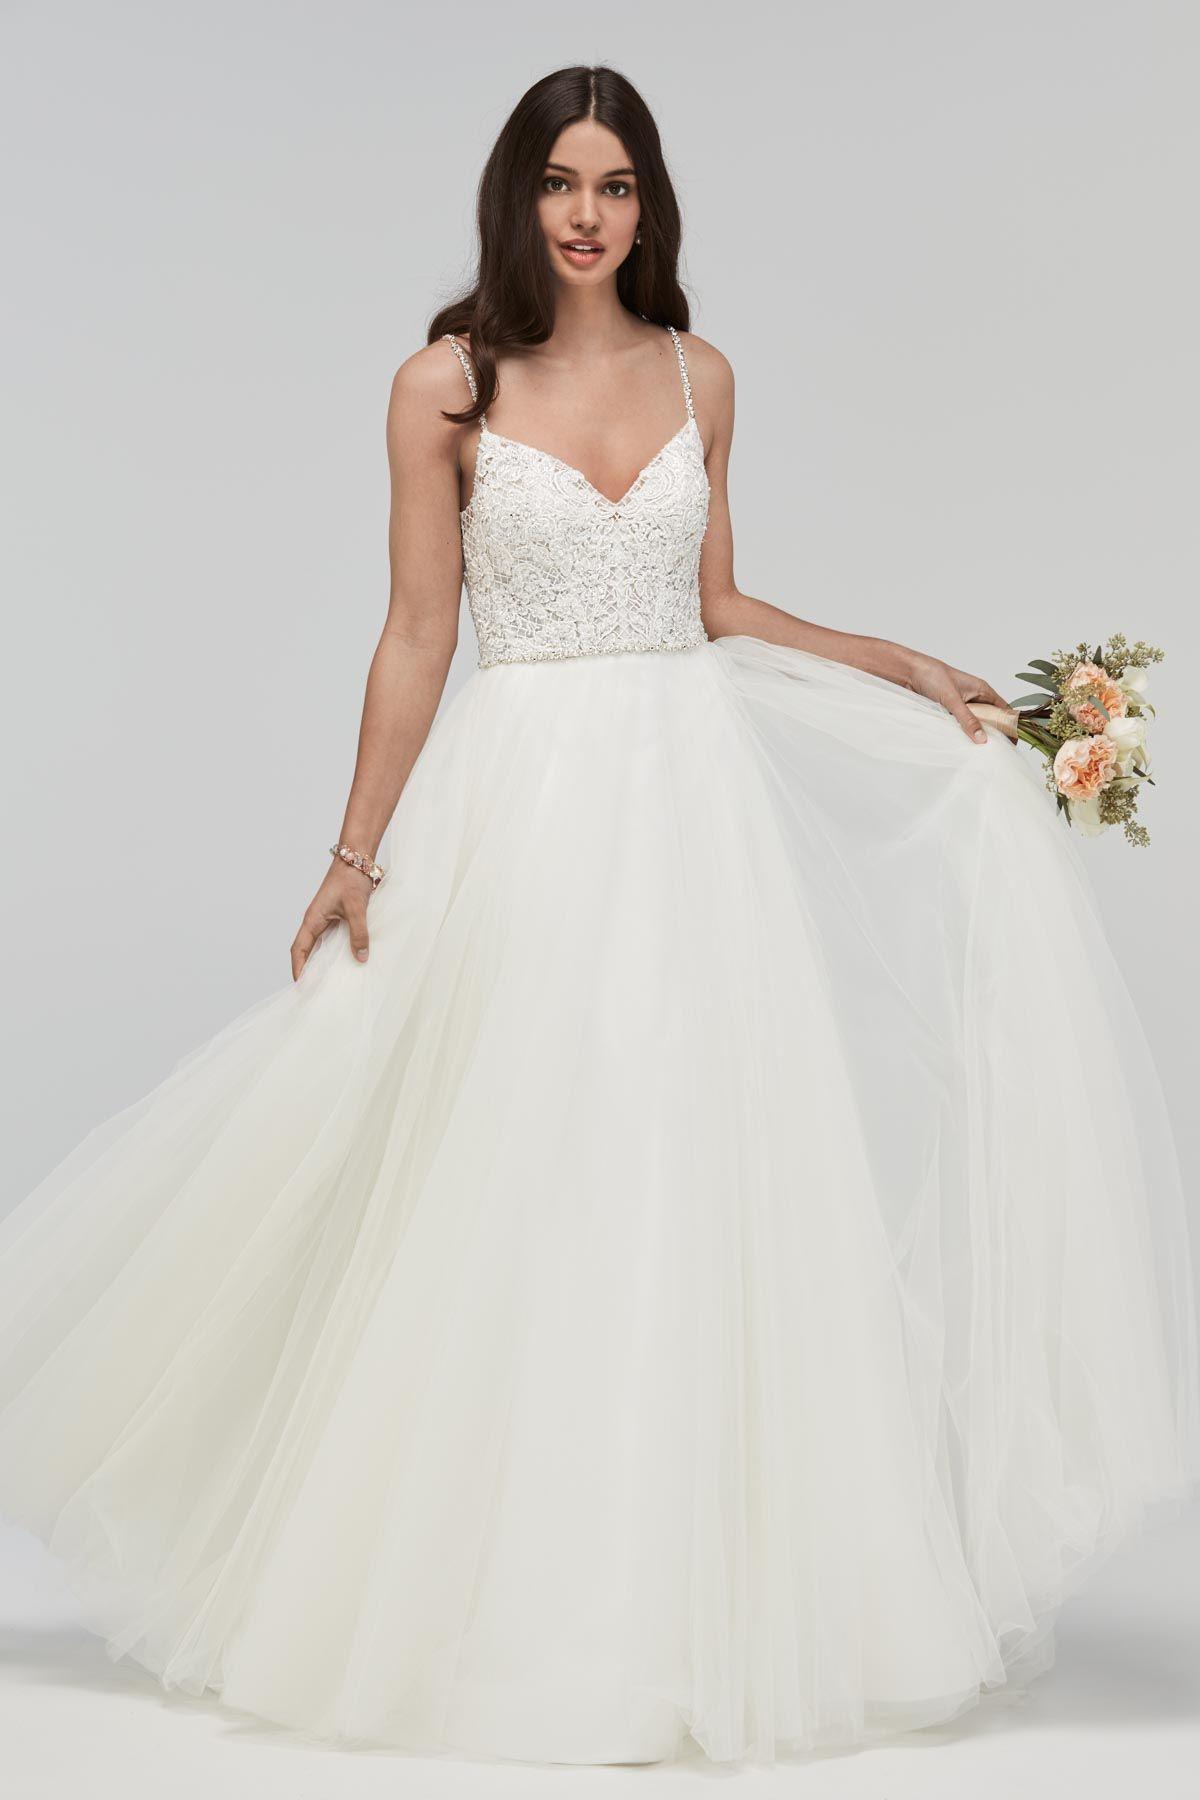 Beaded spaghetti strap wedding dresses  Watters  Jura gown Beaded spaghetti strap bodice with a full